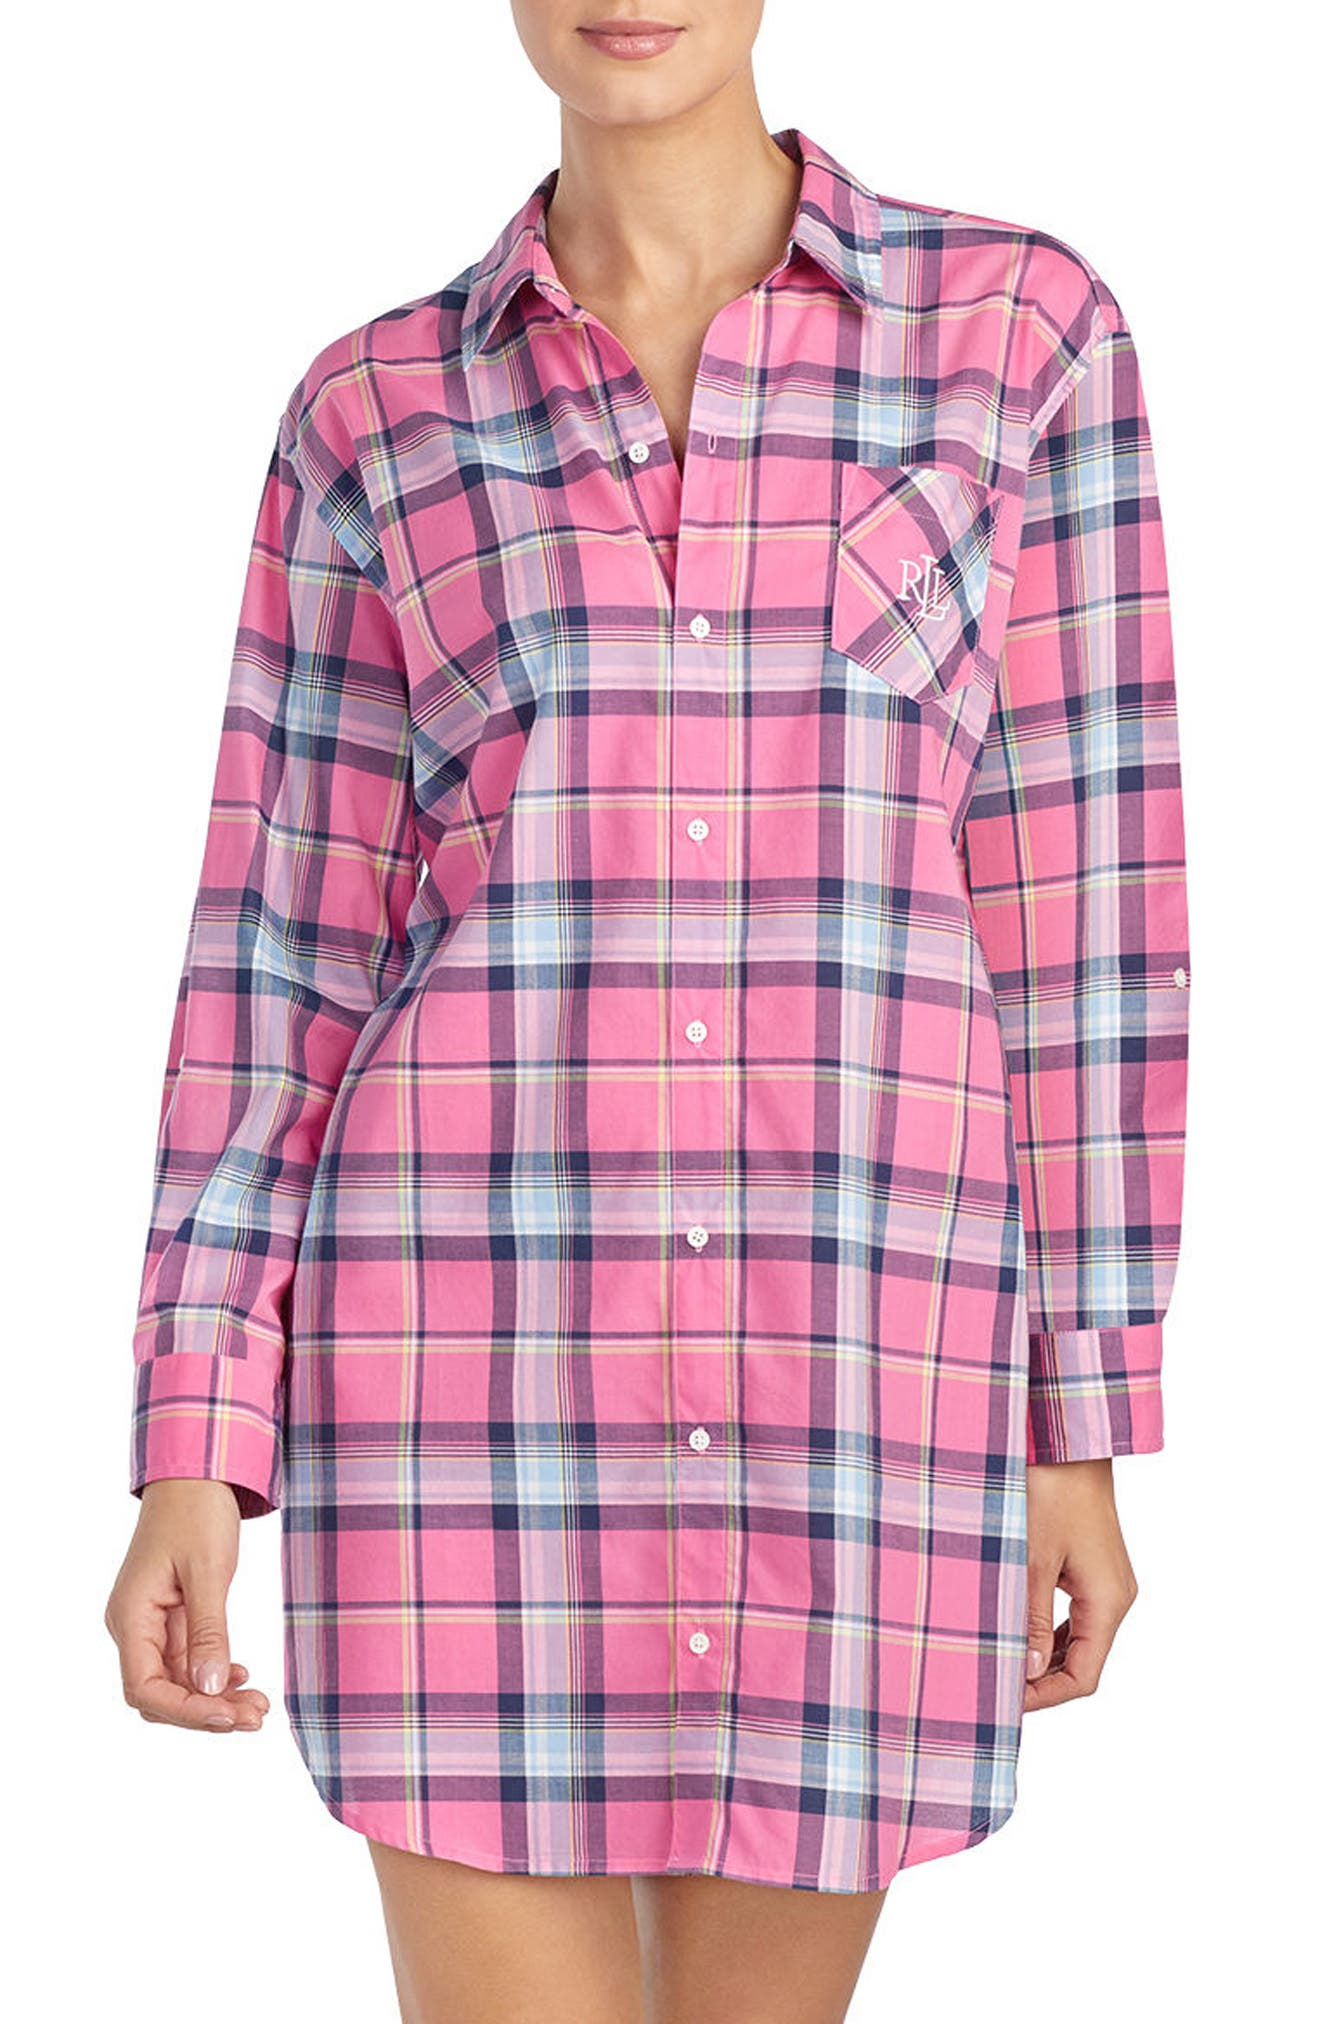 Plaid Sleep Shirt,                             Main thumbnail 1, color,                             610